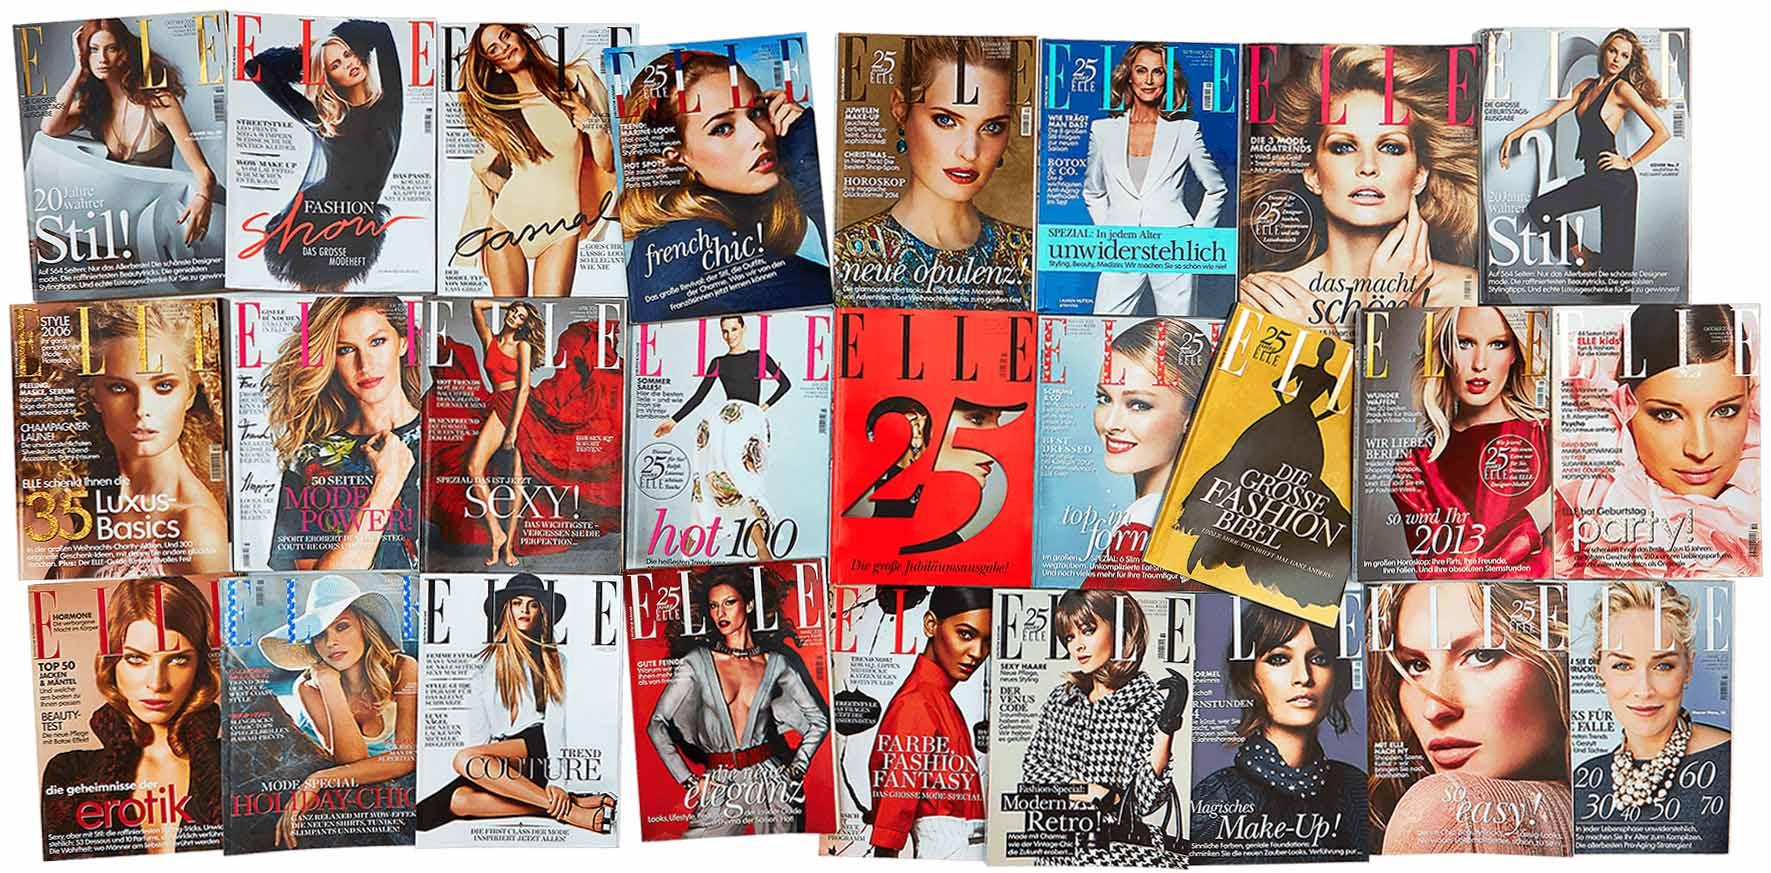 Elle-Magazin / Burda Hearst Publishing